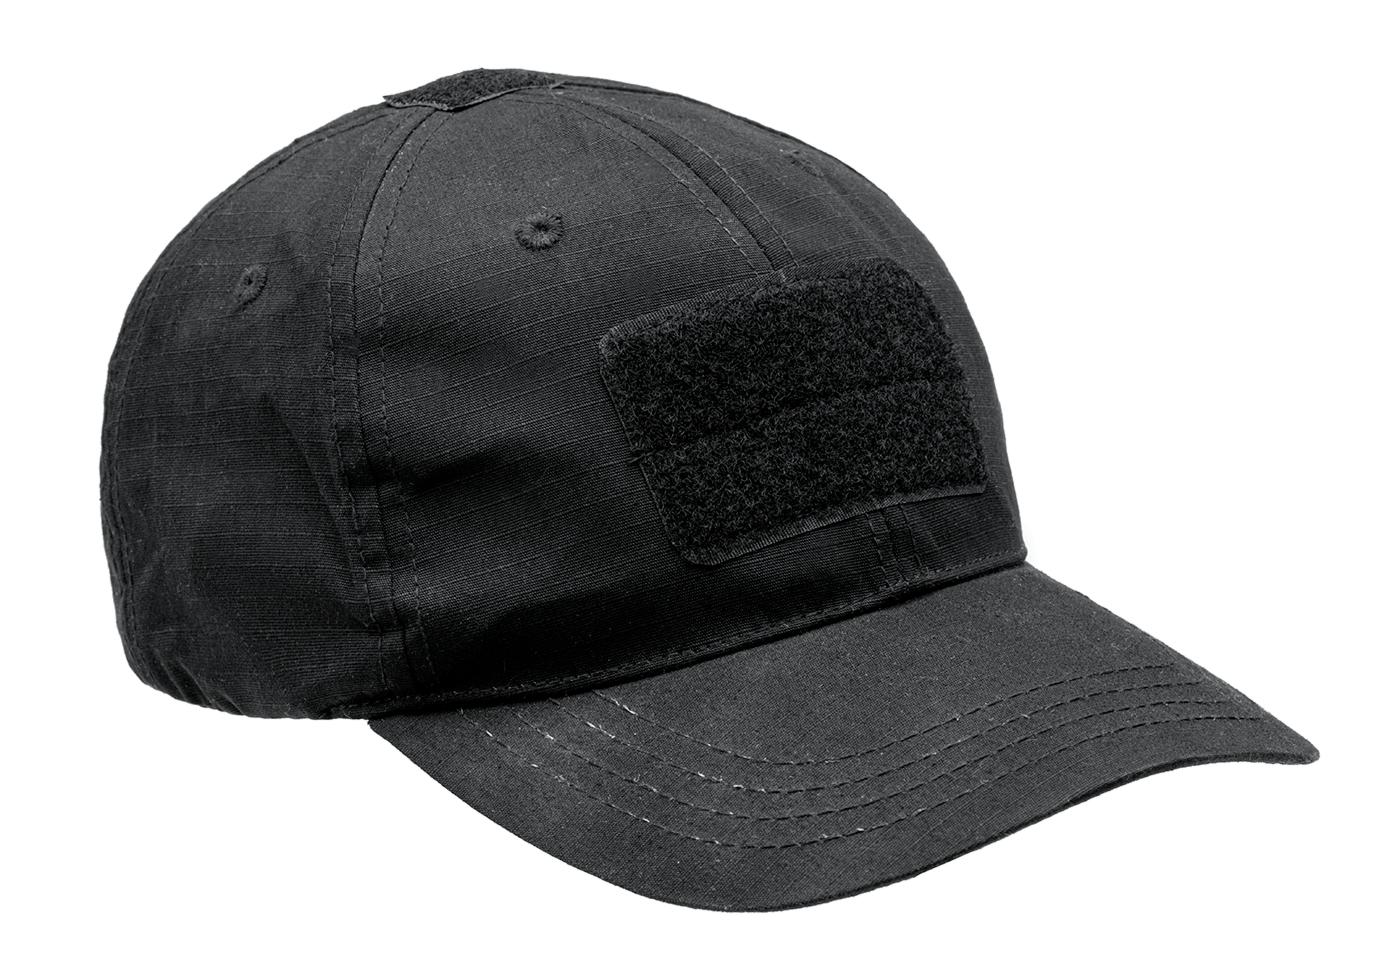 Baseball Cap Black - Caps - Headwear - Garments - invadergear.ch Online shop d3a7b646ce21